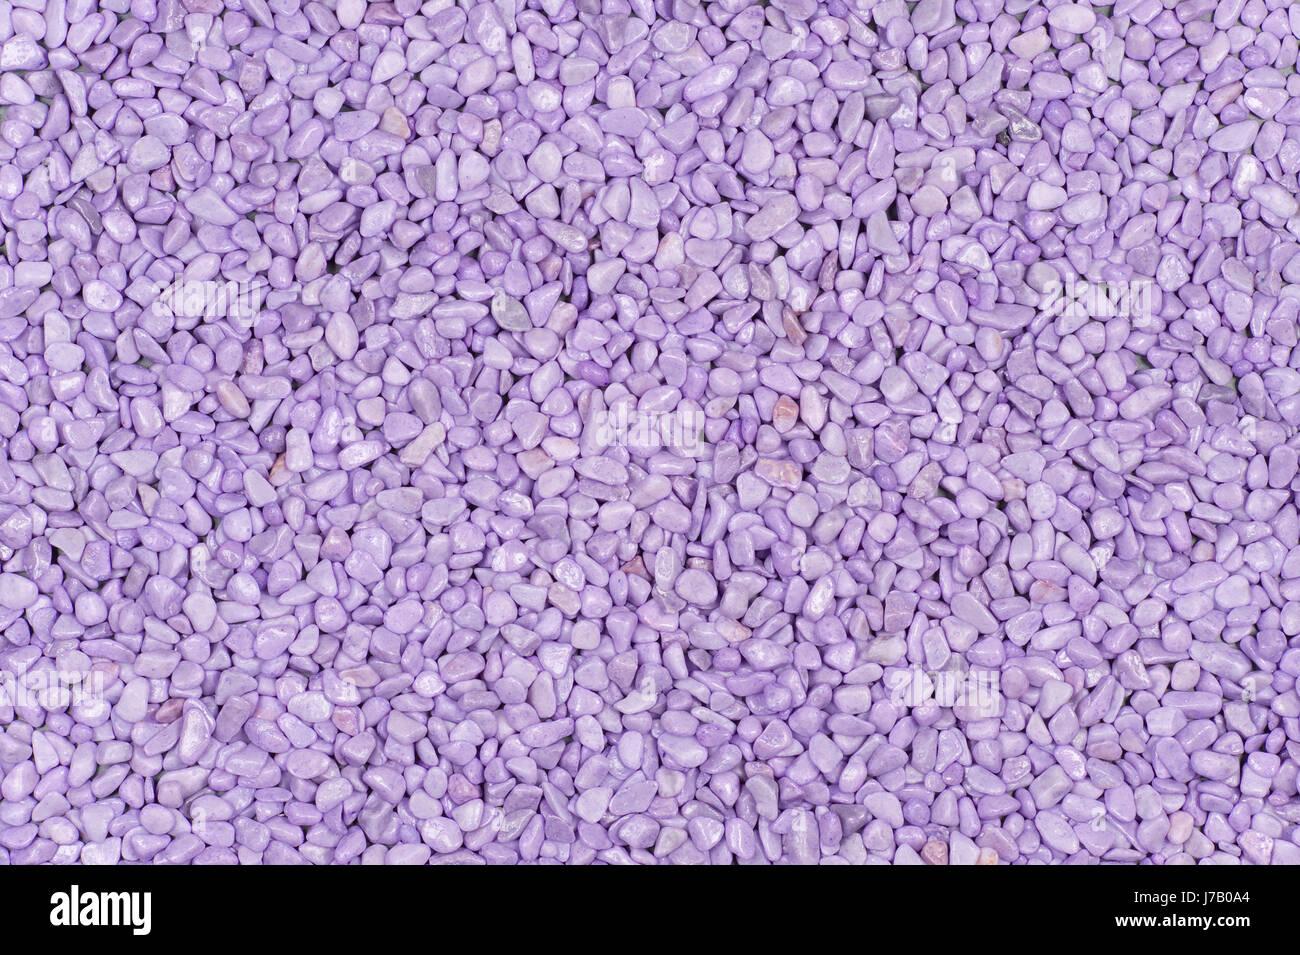 gravel purple surface minerals description field structure backdrop background - Stock Image